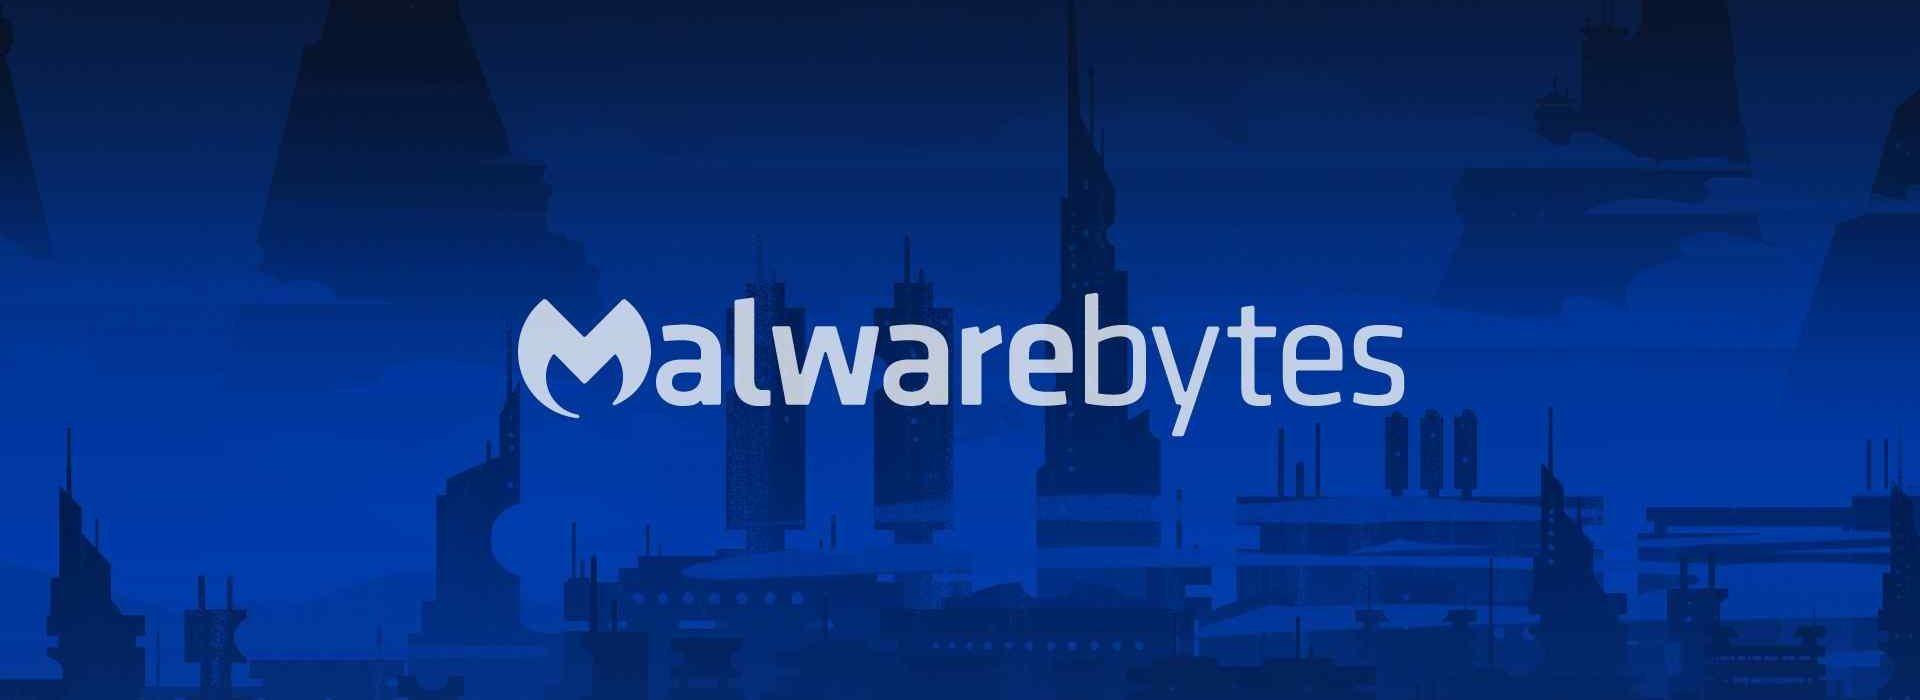 malwarebytes code 2